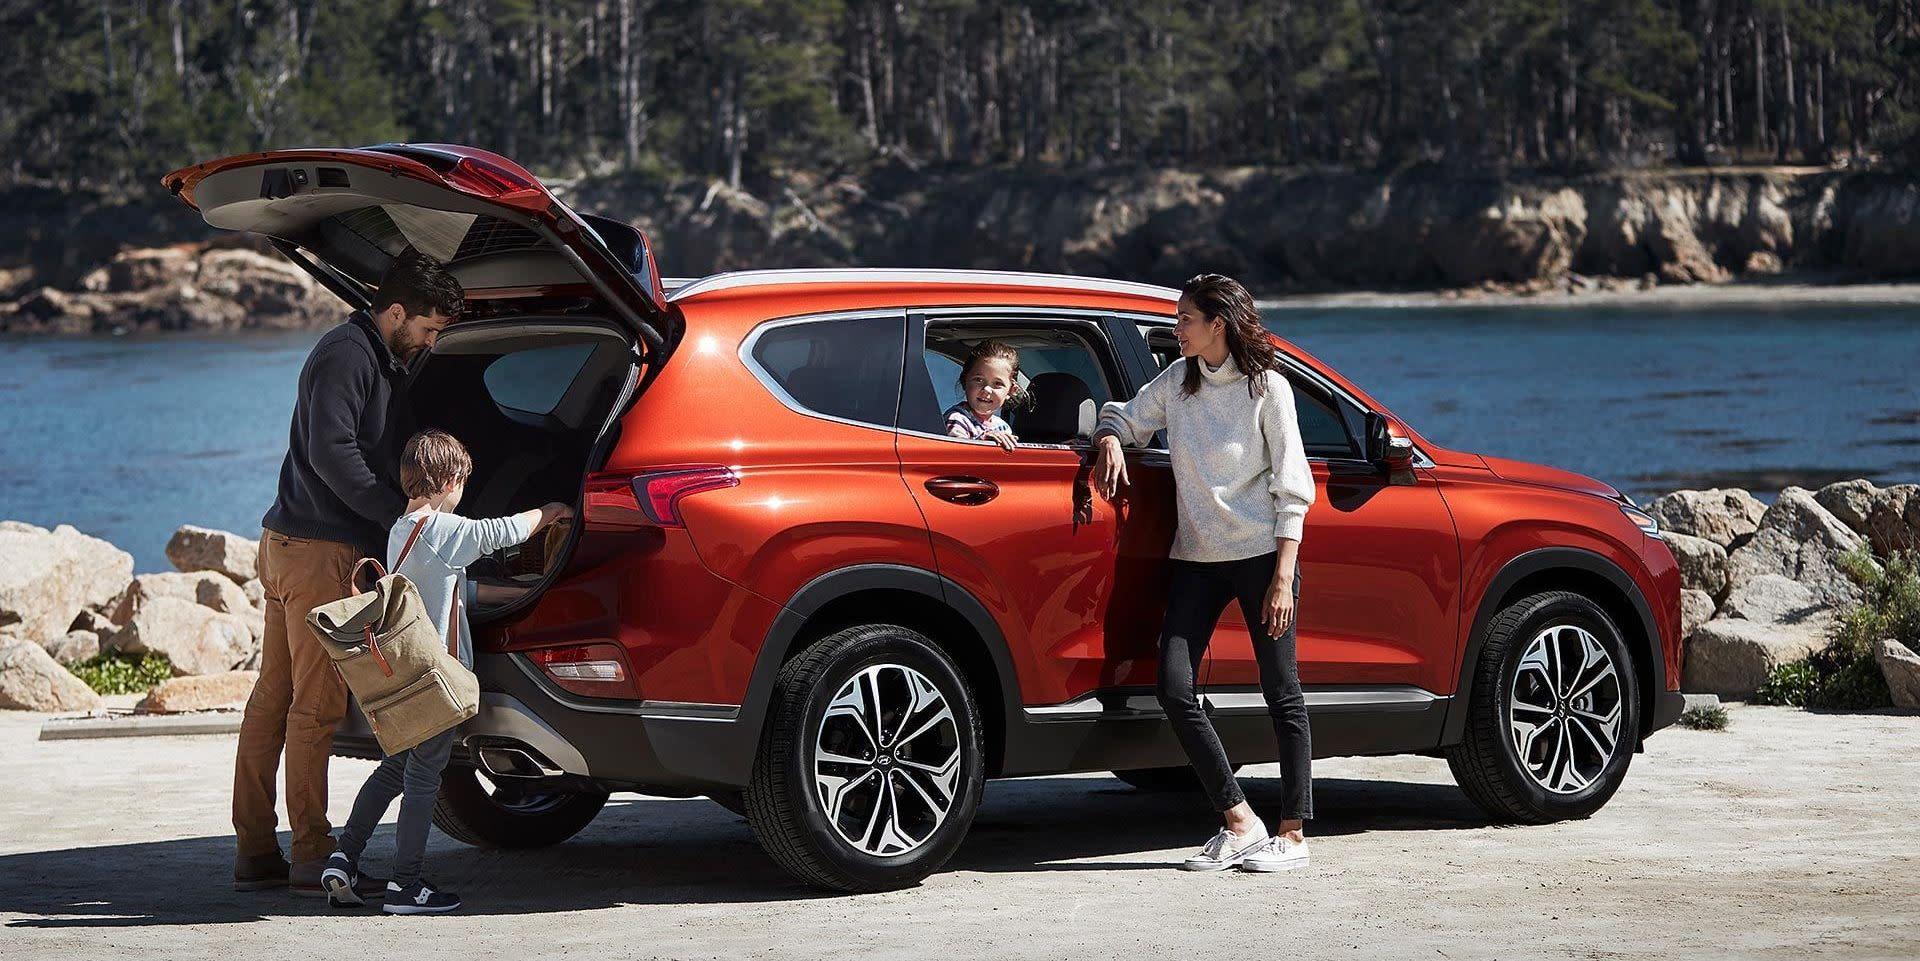 2019 Hyundai Santa Fe for Lease near College Park, MD